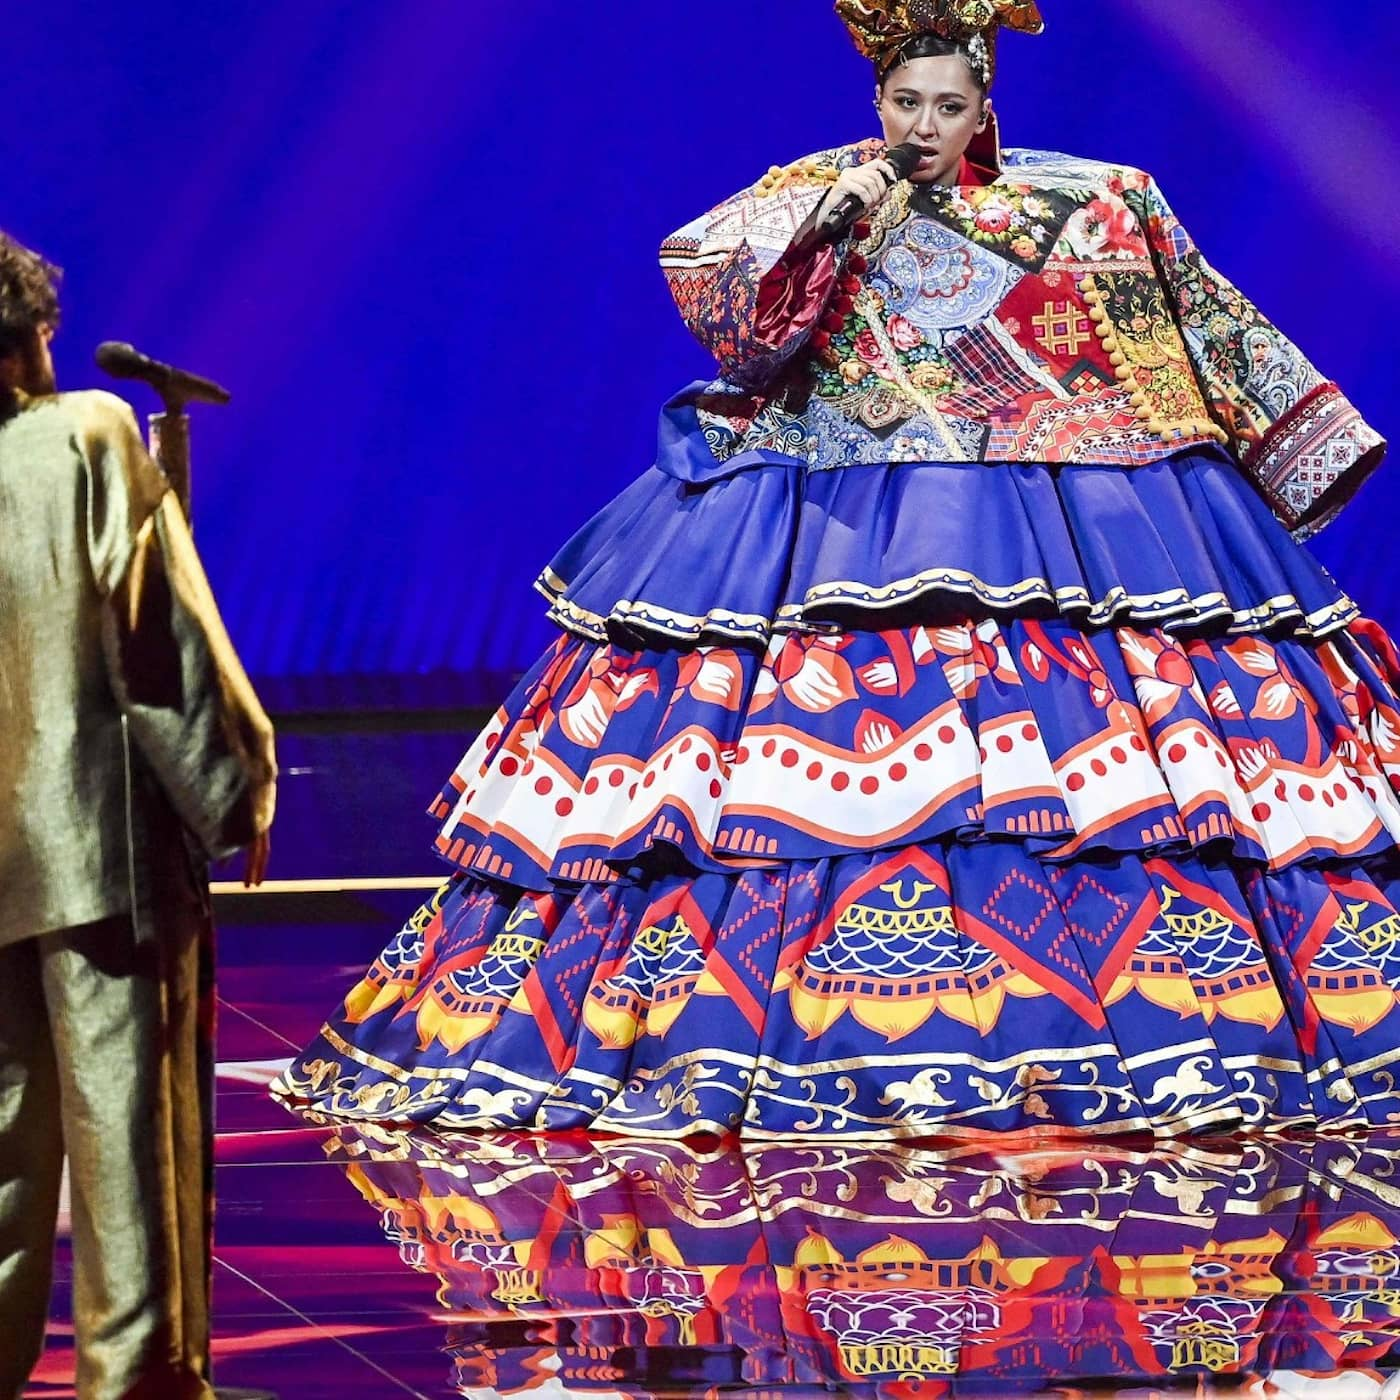 Utrikespolitiken i Eurovision